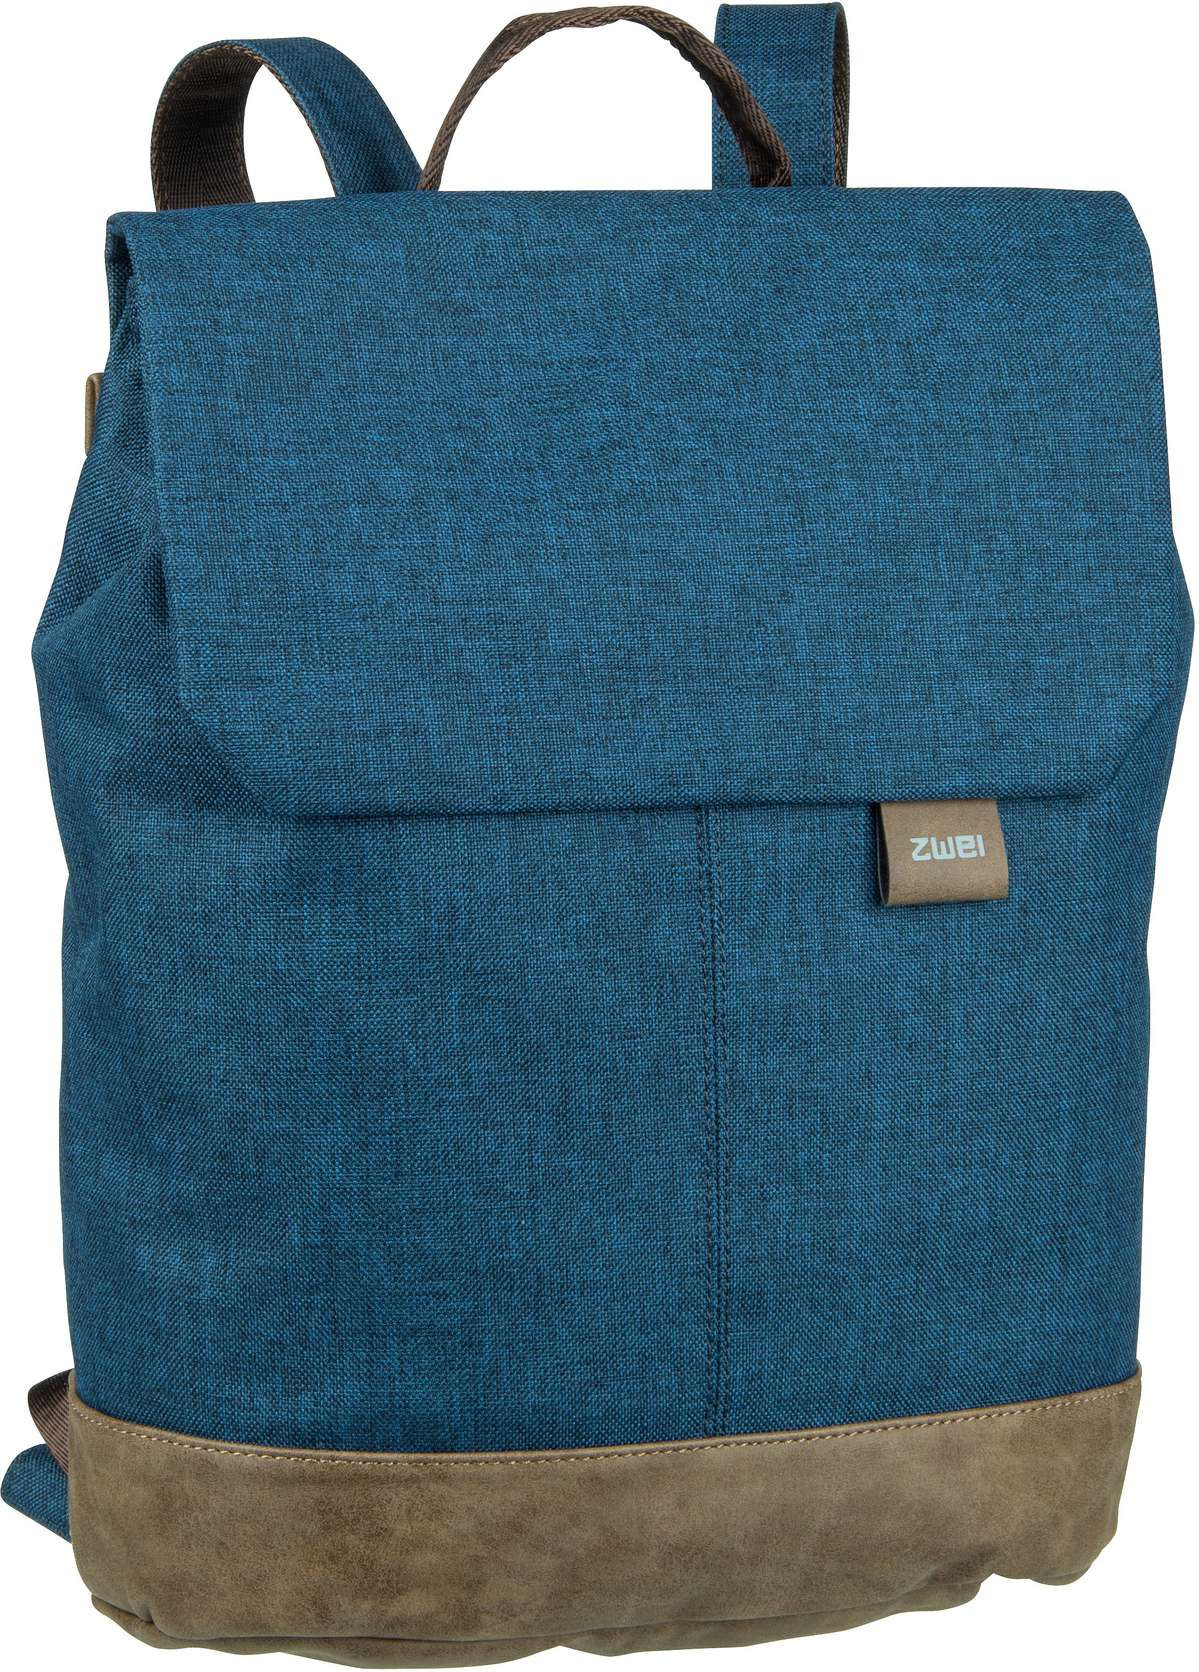 Rucksack / Daypack Olli OR13 Blue (7 Liter)